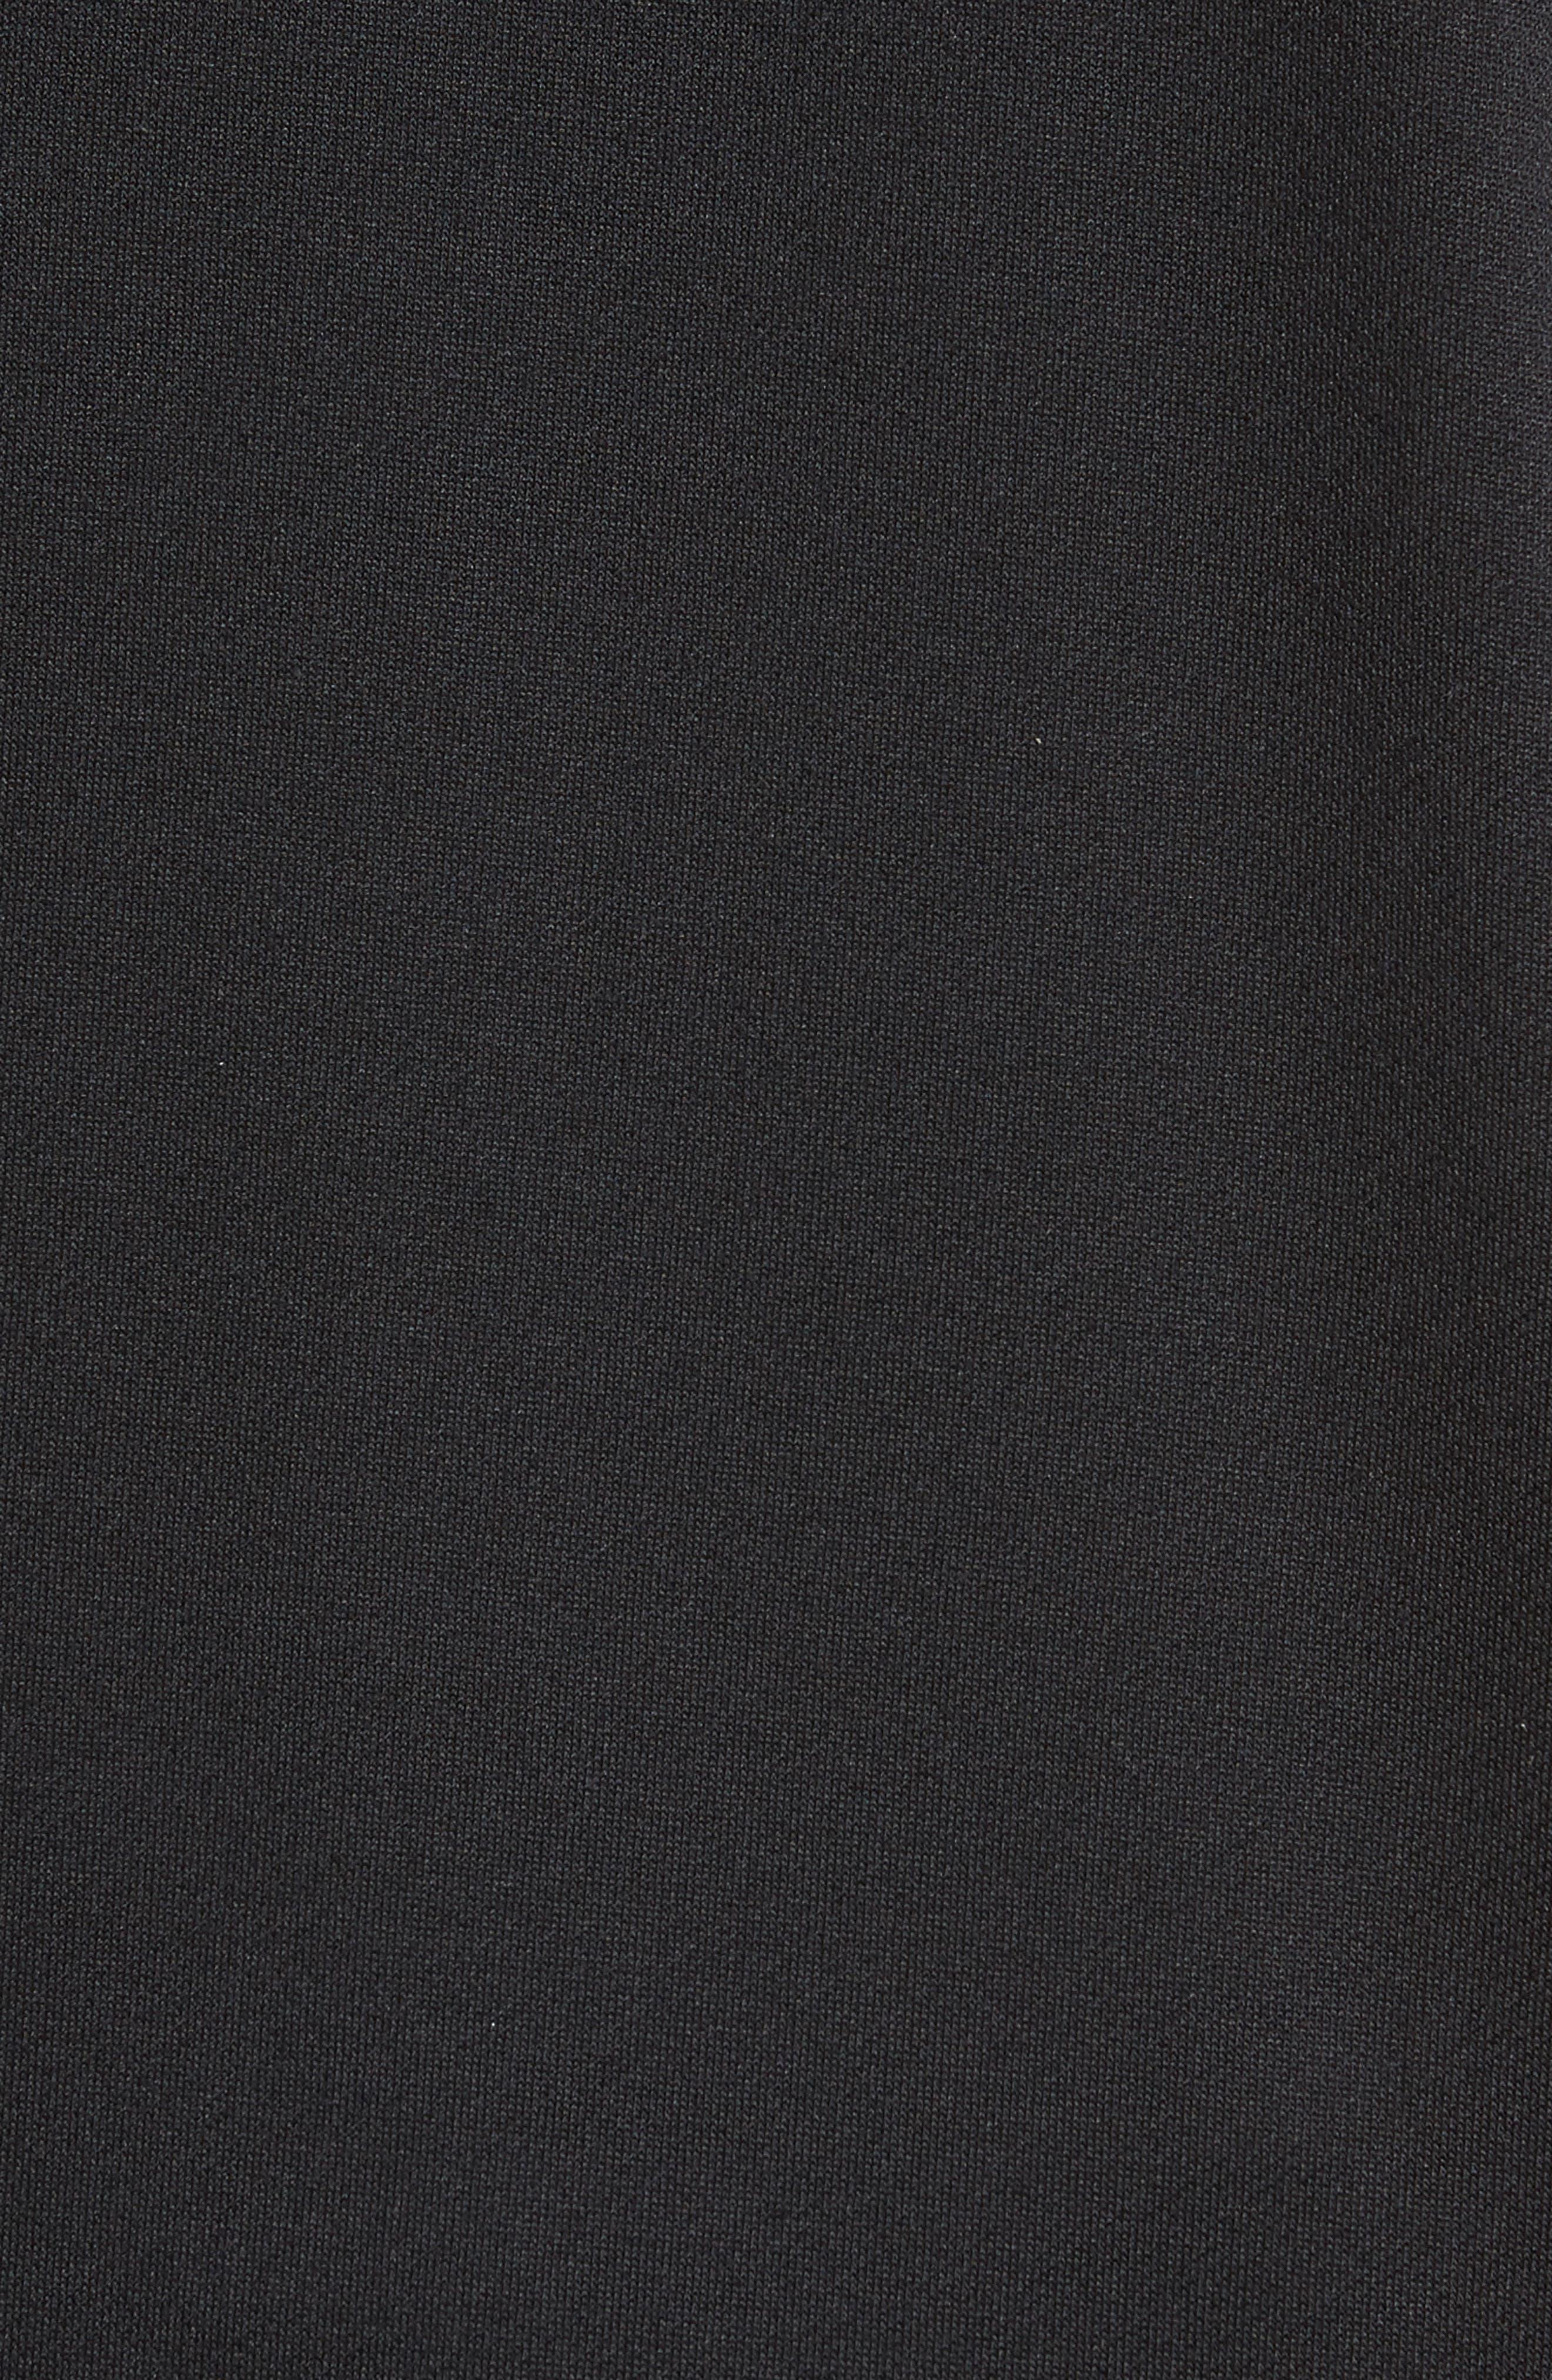 Training Dry Top PX Sleeveless Hoodie,                             Alternate thumbnail 5, color,                             BLACK/ BLACK/ WHITE